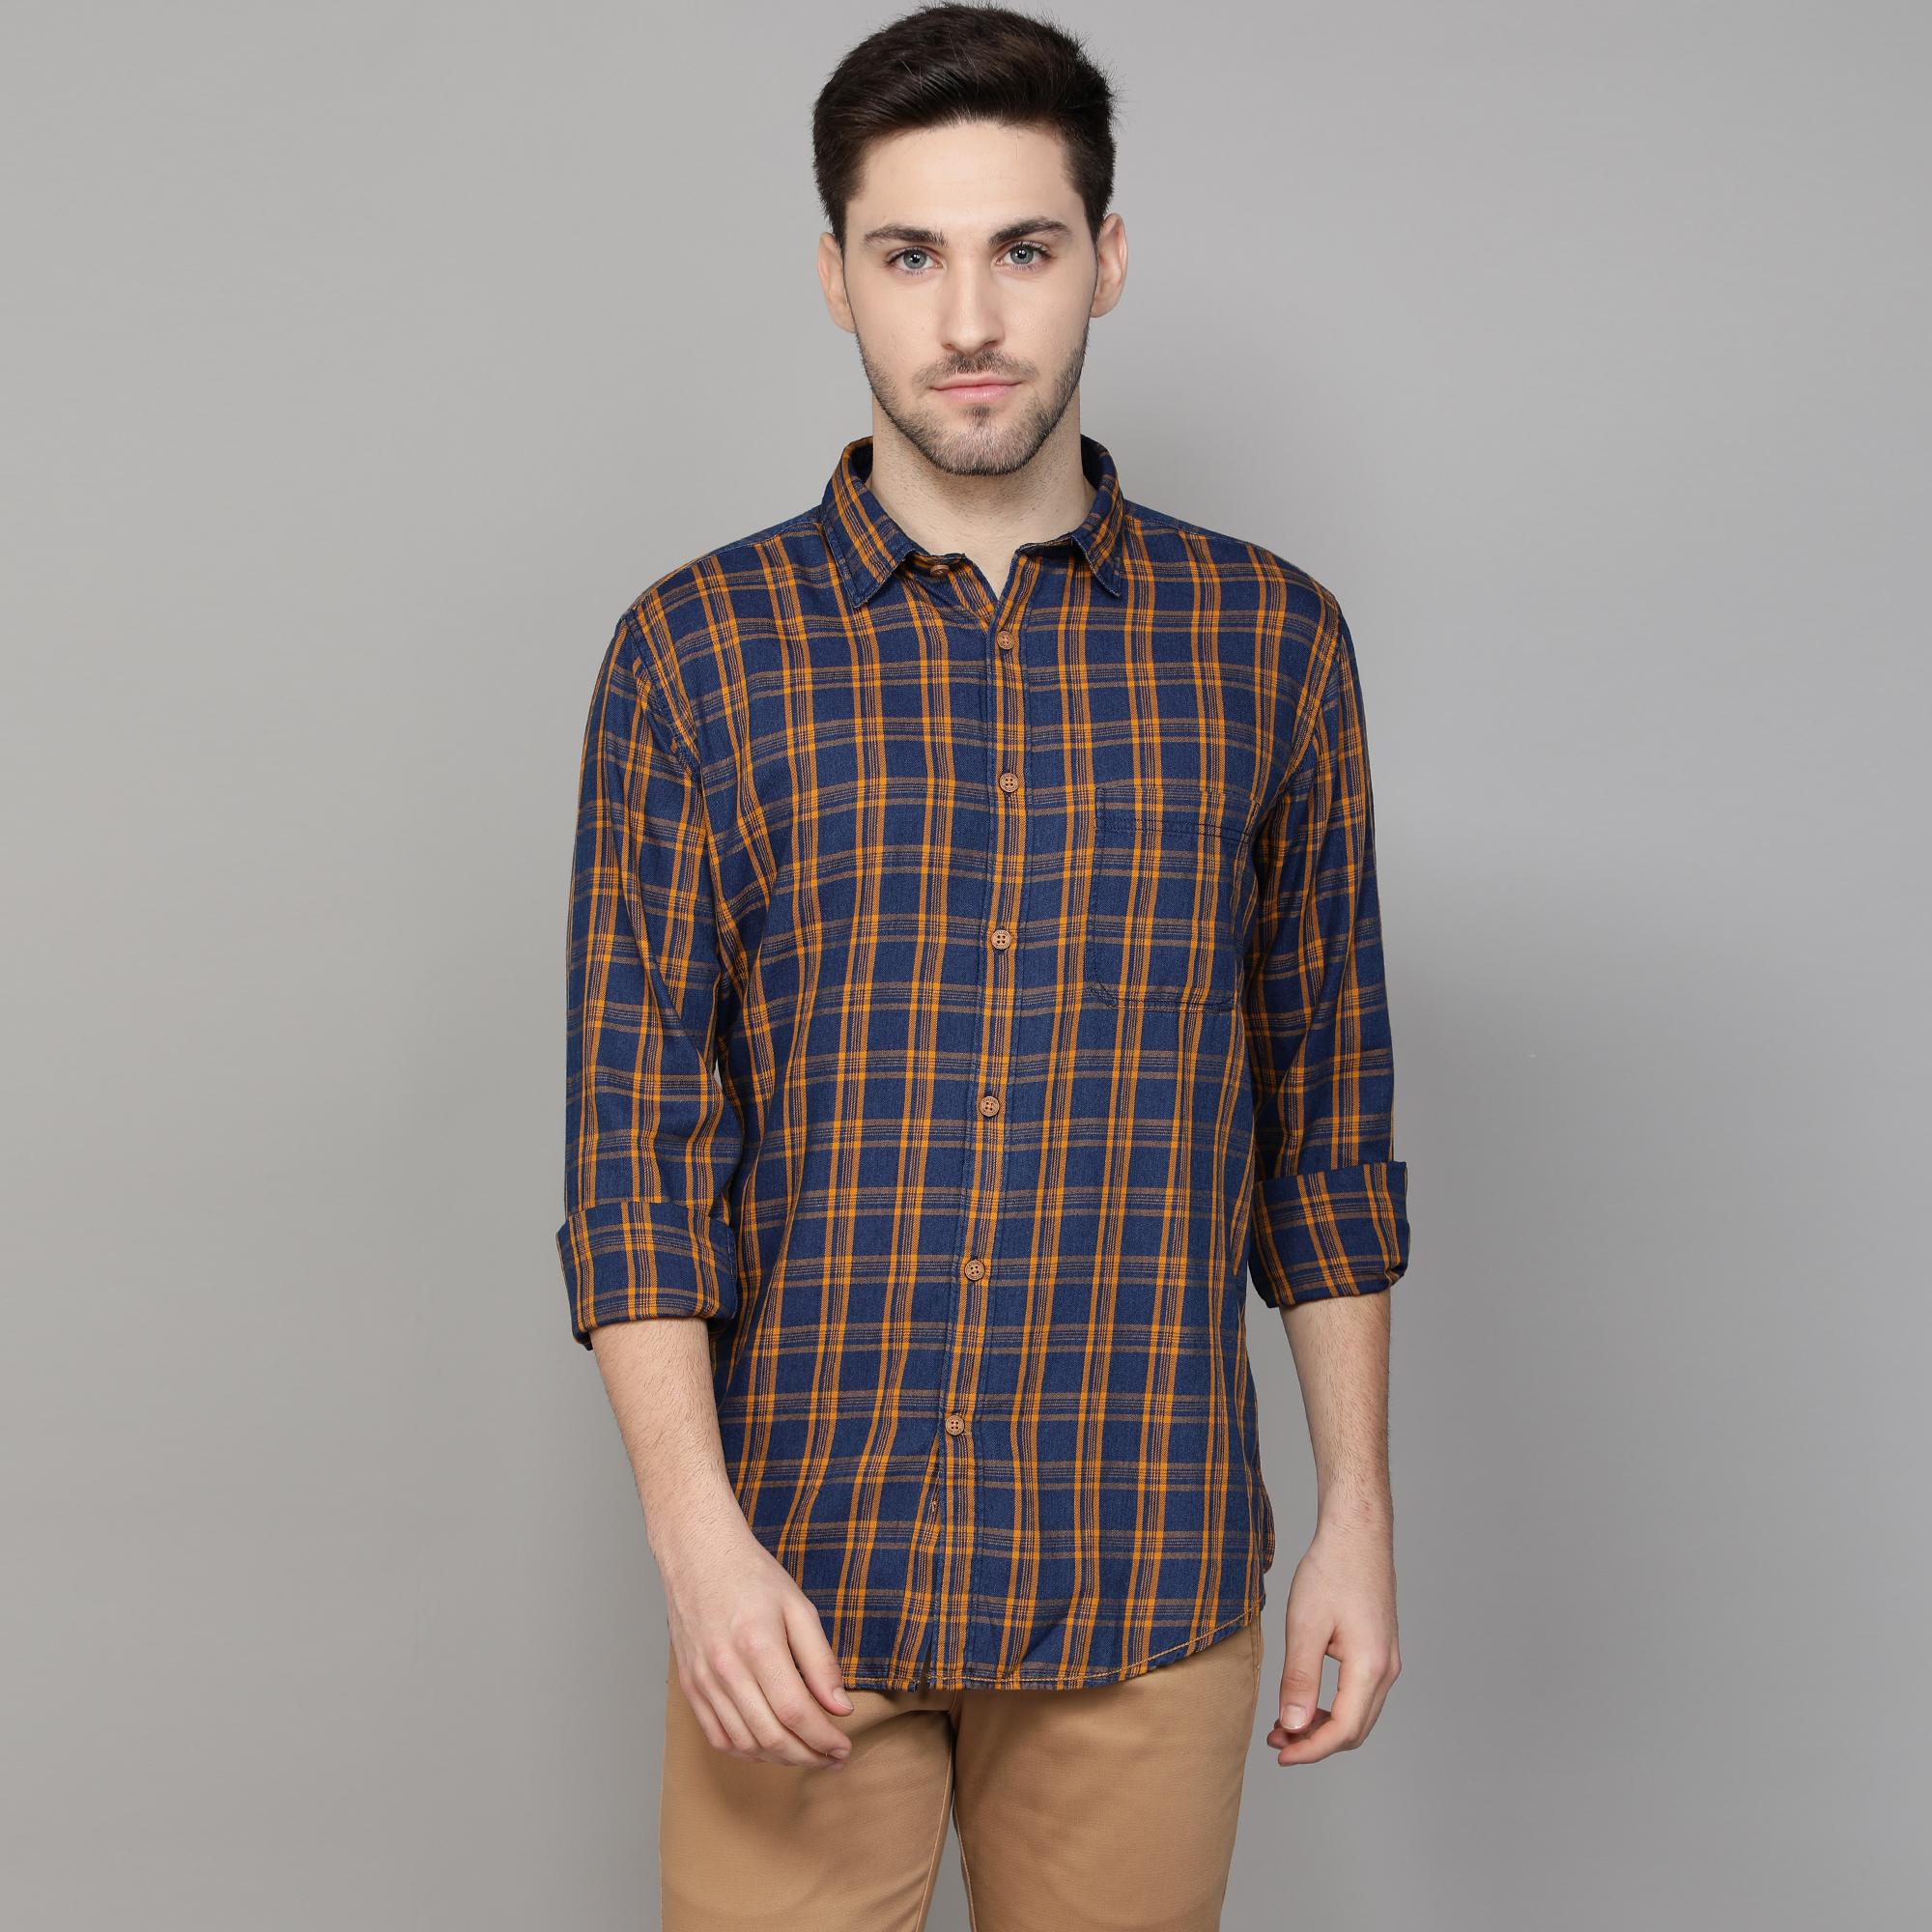 Callino London | Callino London Men's Mustard Smart Fit Checkered Casual Cotton Shirt